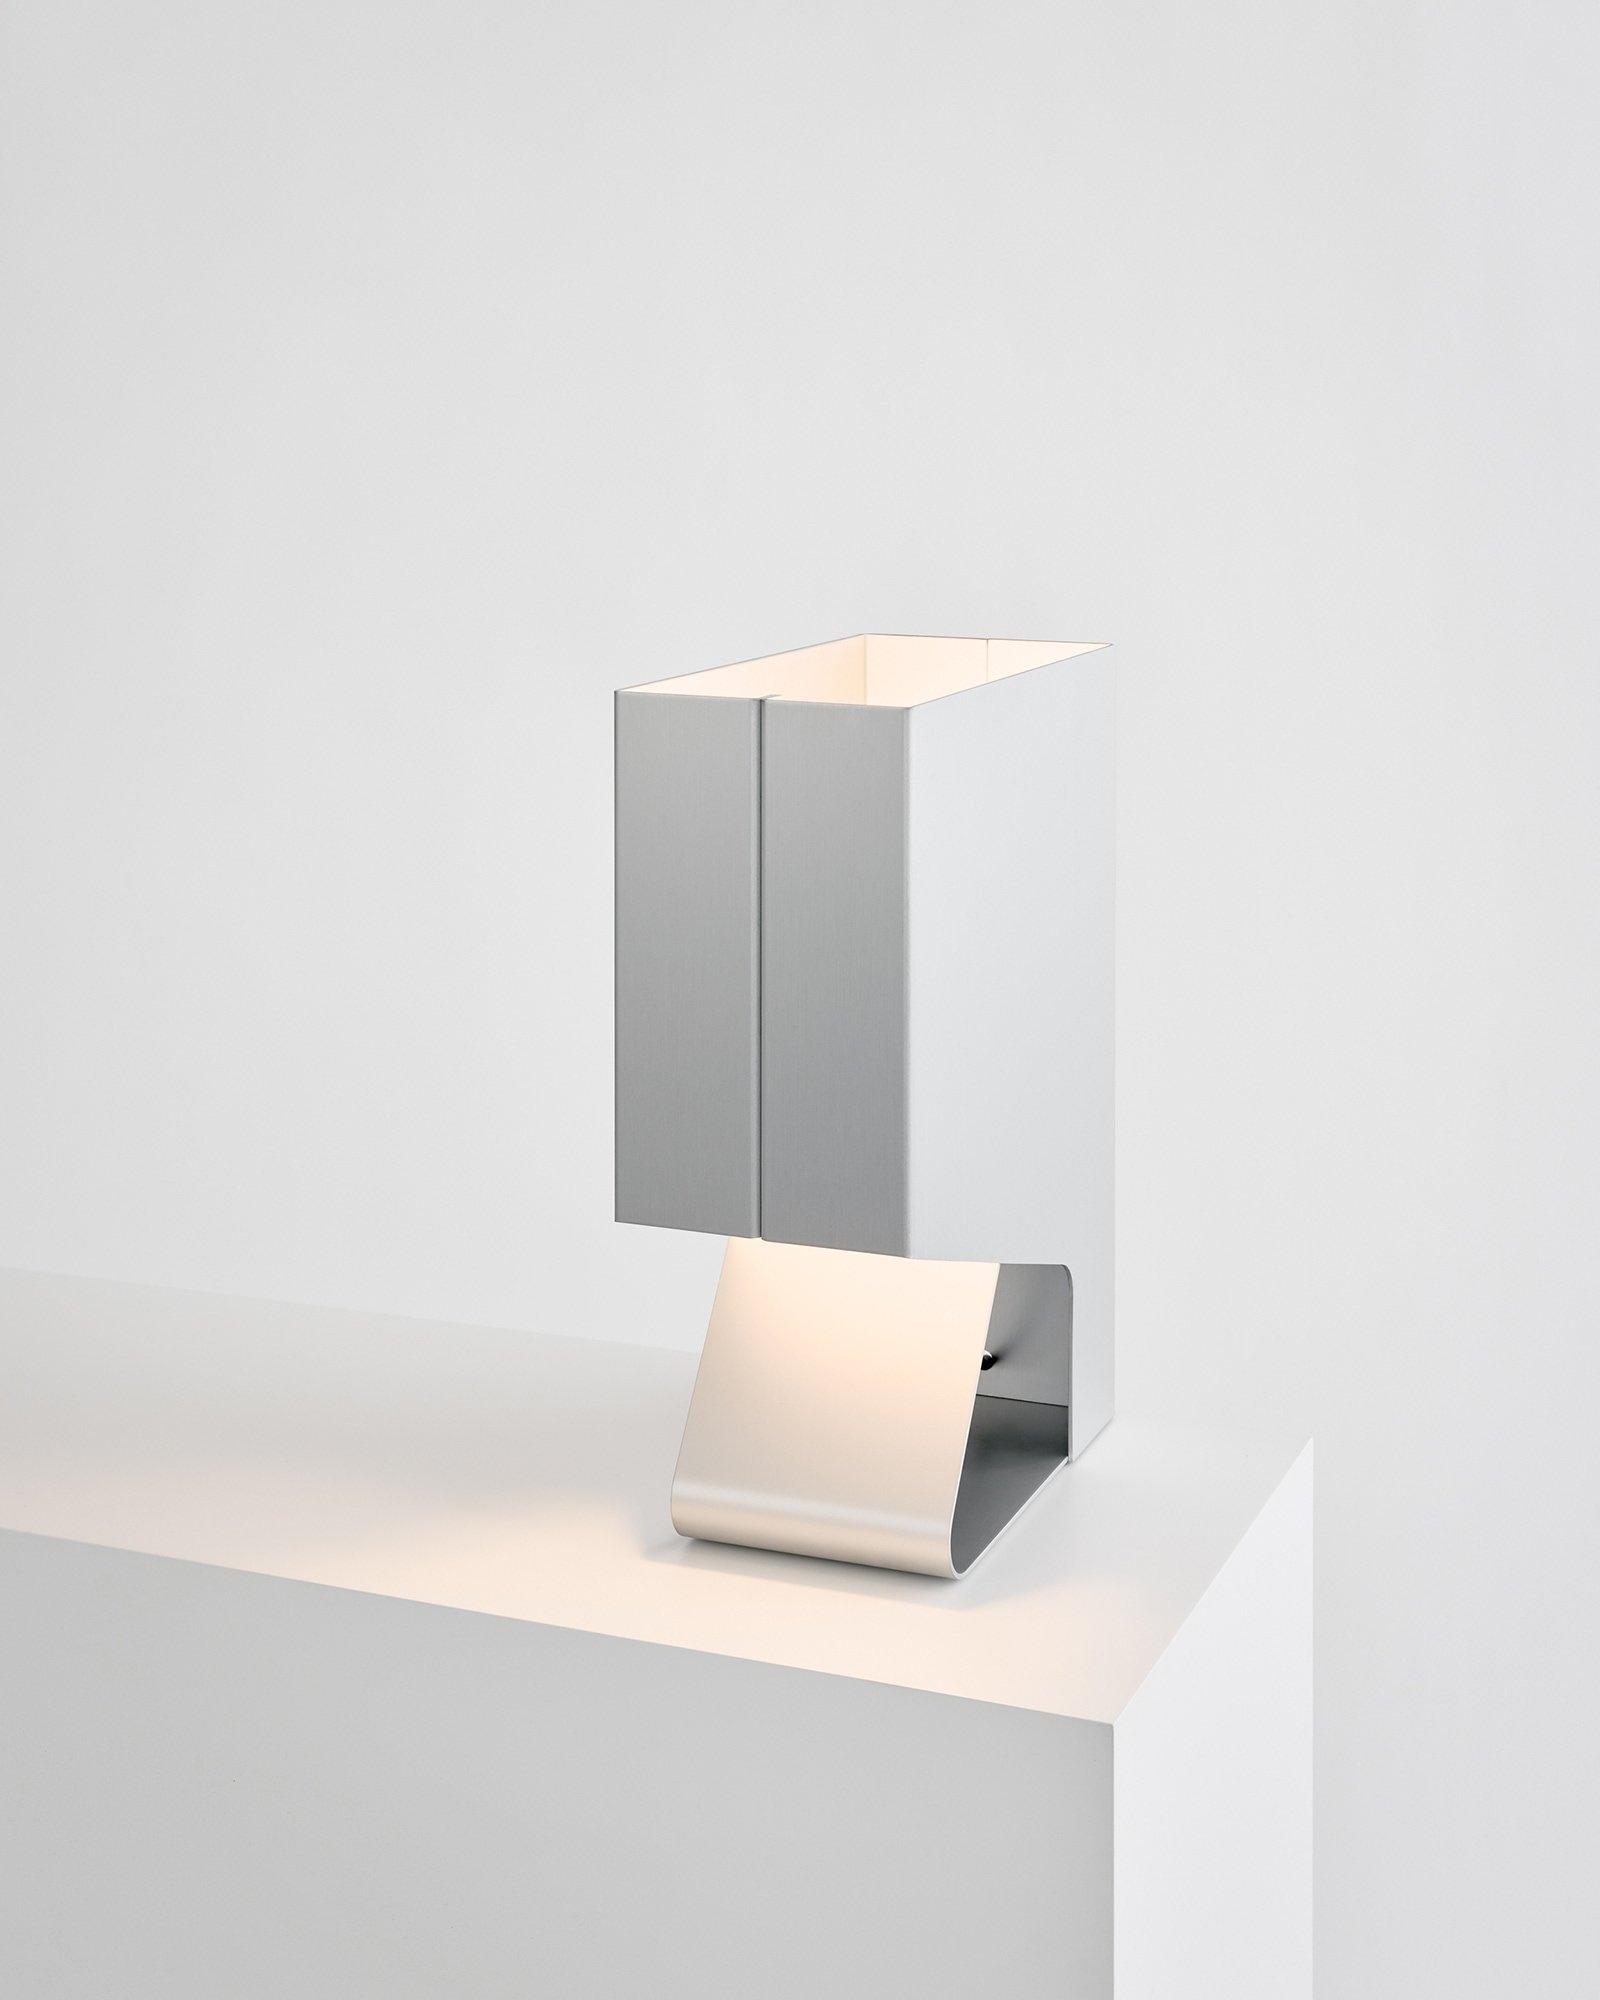 GT Lamp Garcia Tamjidi Architec - minimalissimo | ello